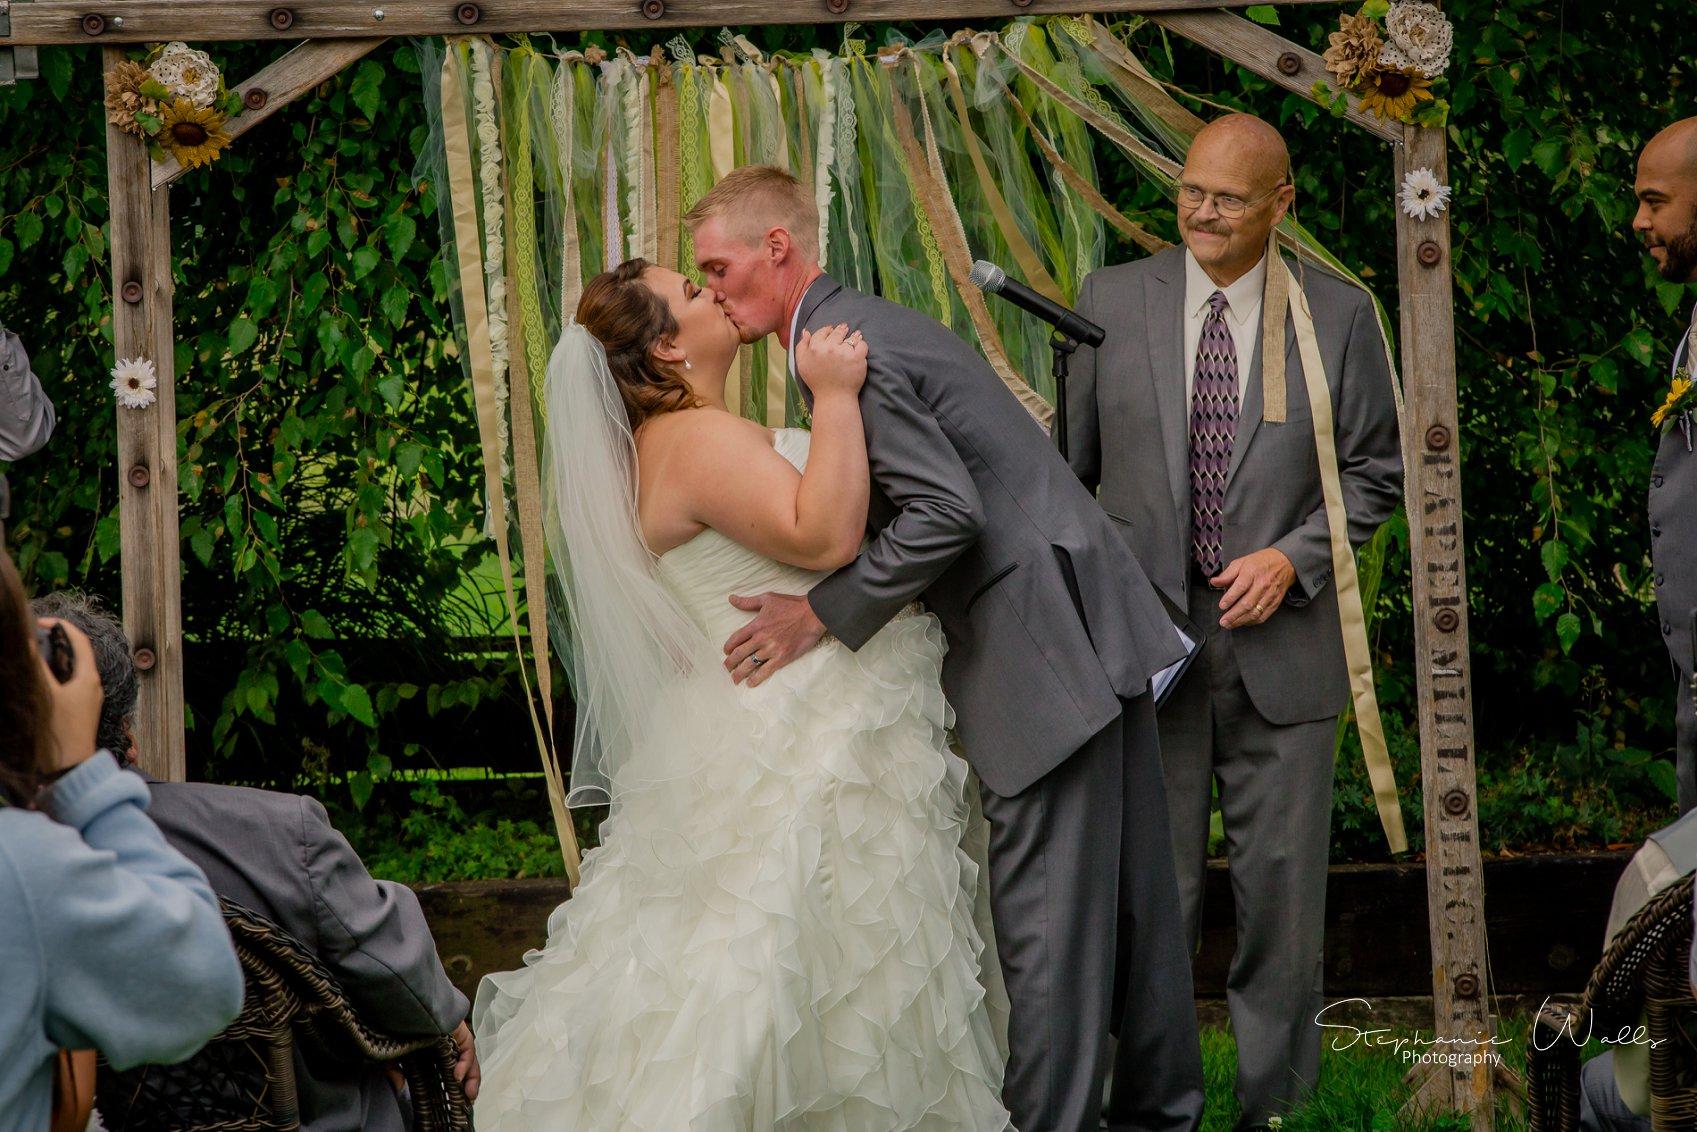 Kimble Wedding 225 Marlena & Allans | Snohomish Red Barn Events (Stocker Farms) | Snohomish, Wa Wedding Photographer